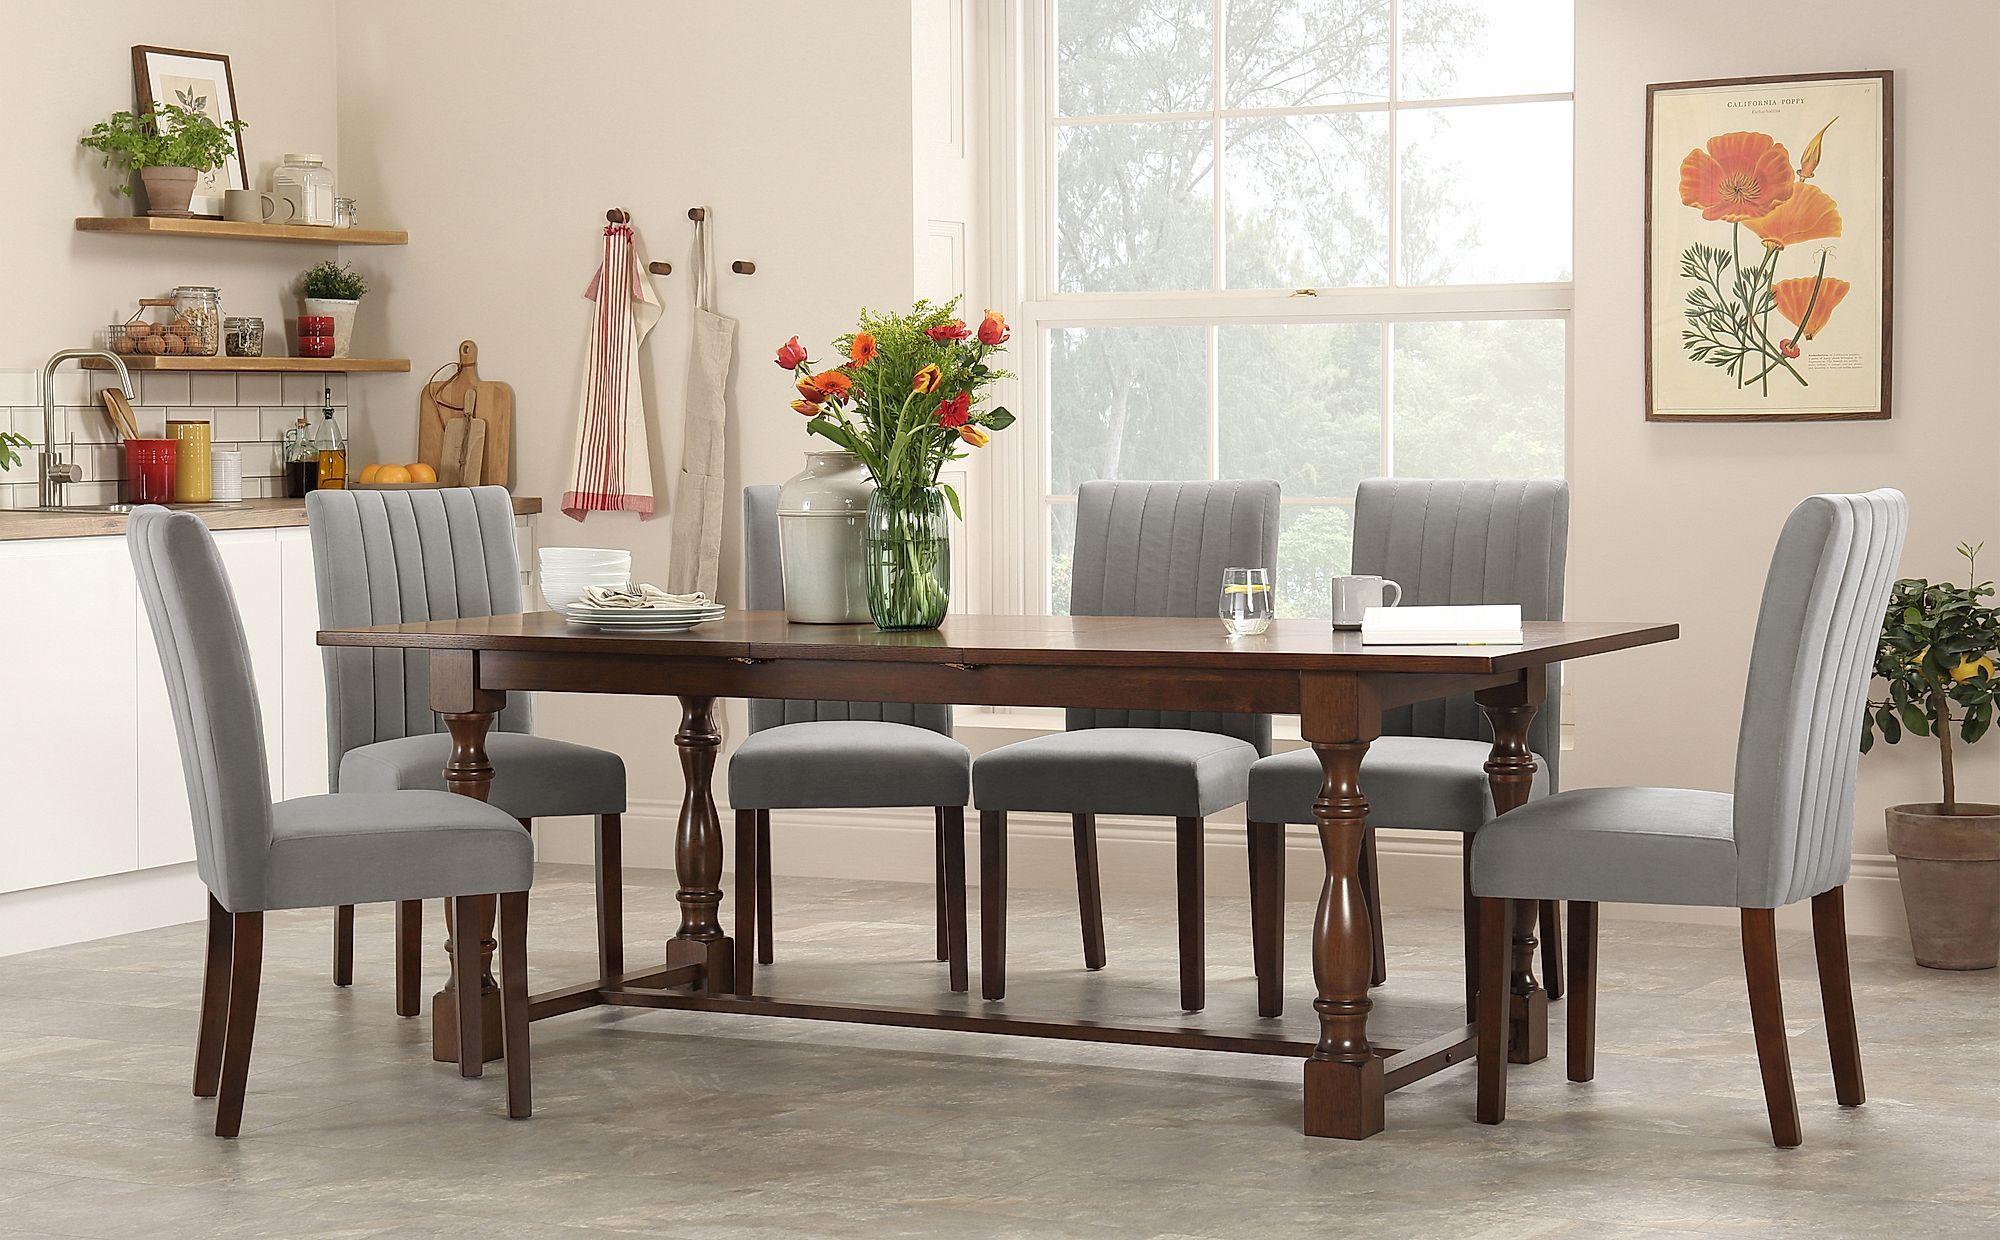 Devonshire Dark Wood Extending Dining Table With 4 Salisbury